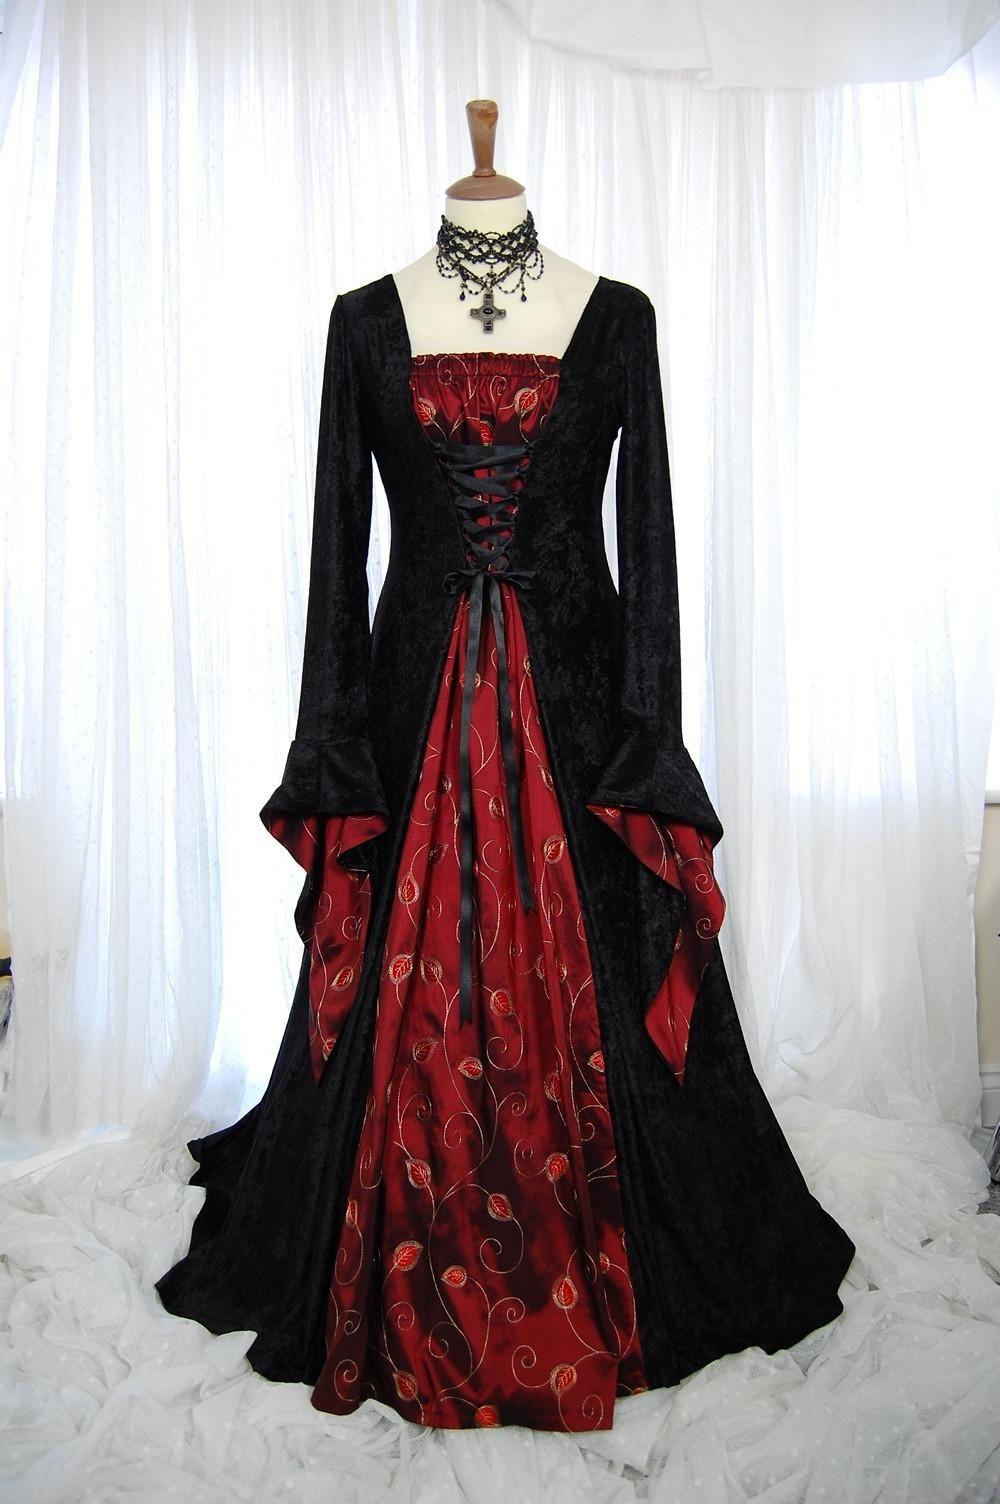 teal wedding decorations Pagan wedding dresses, Prom